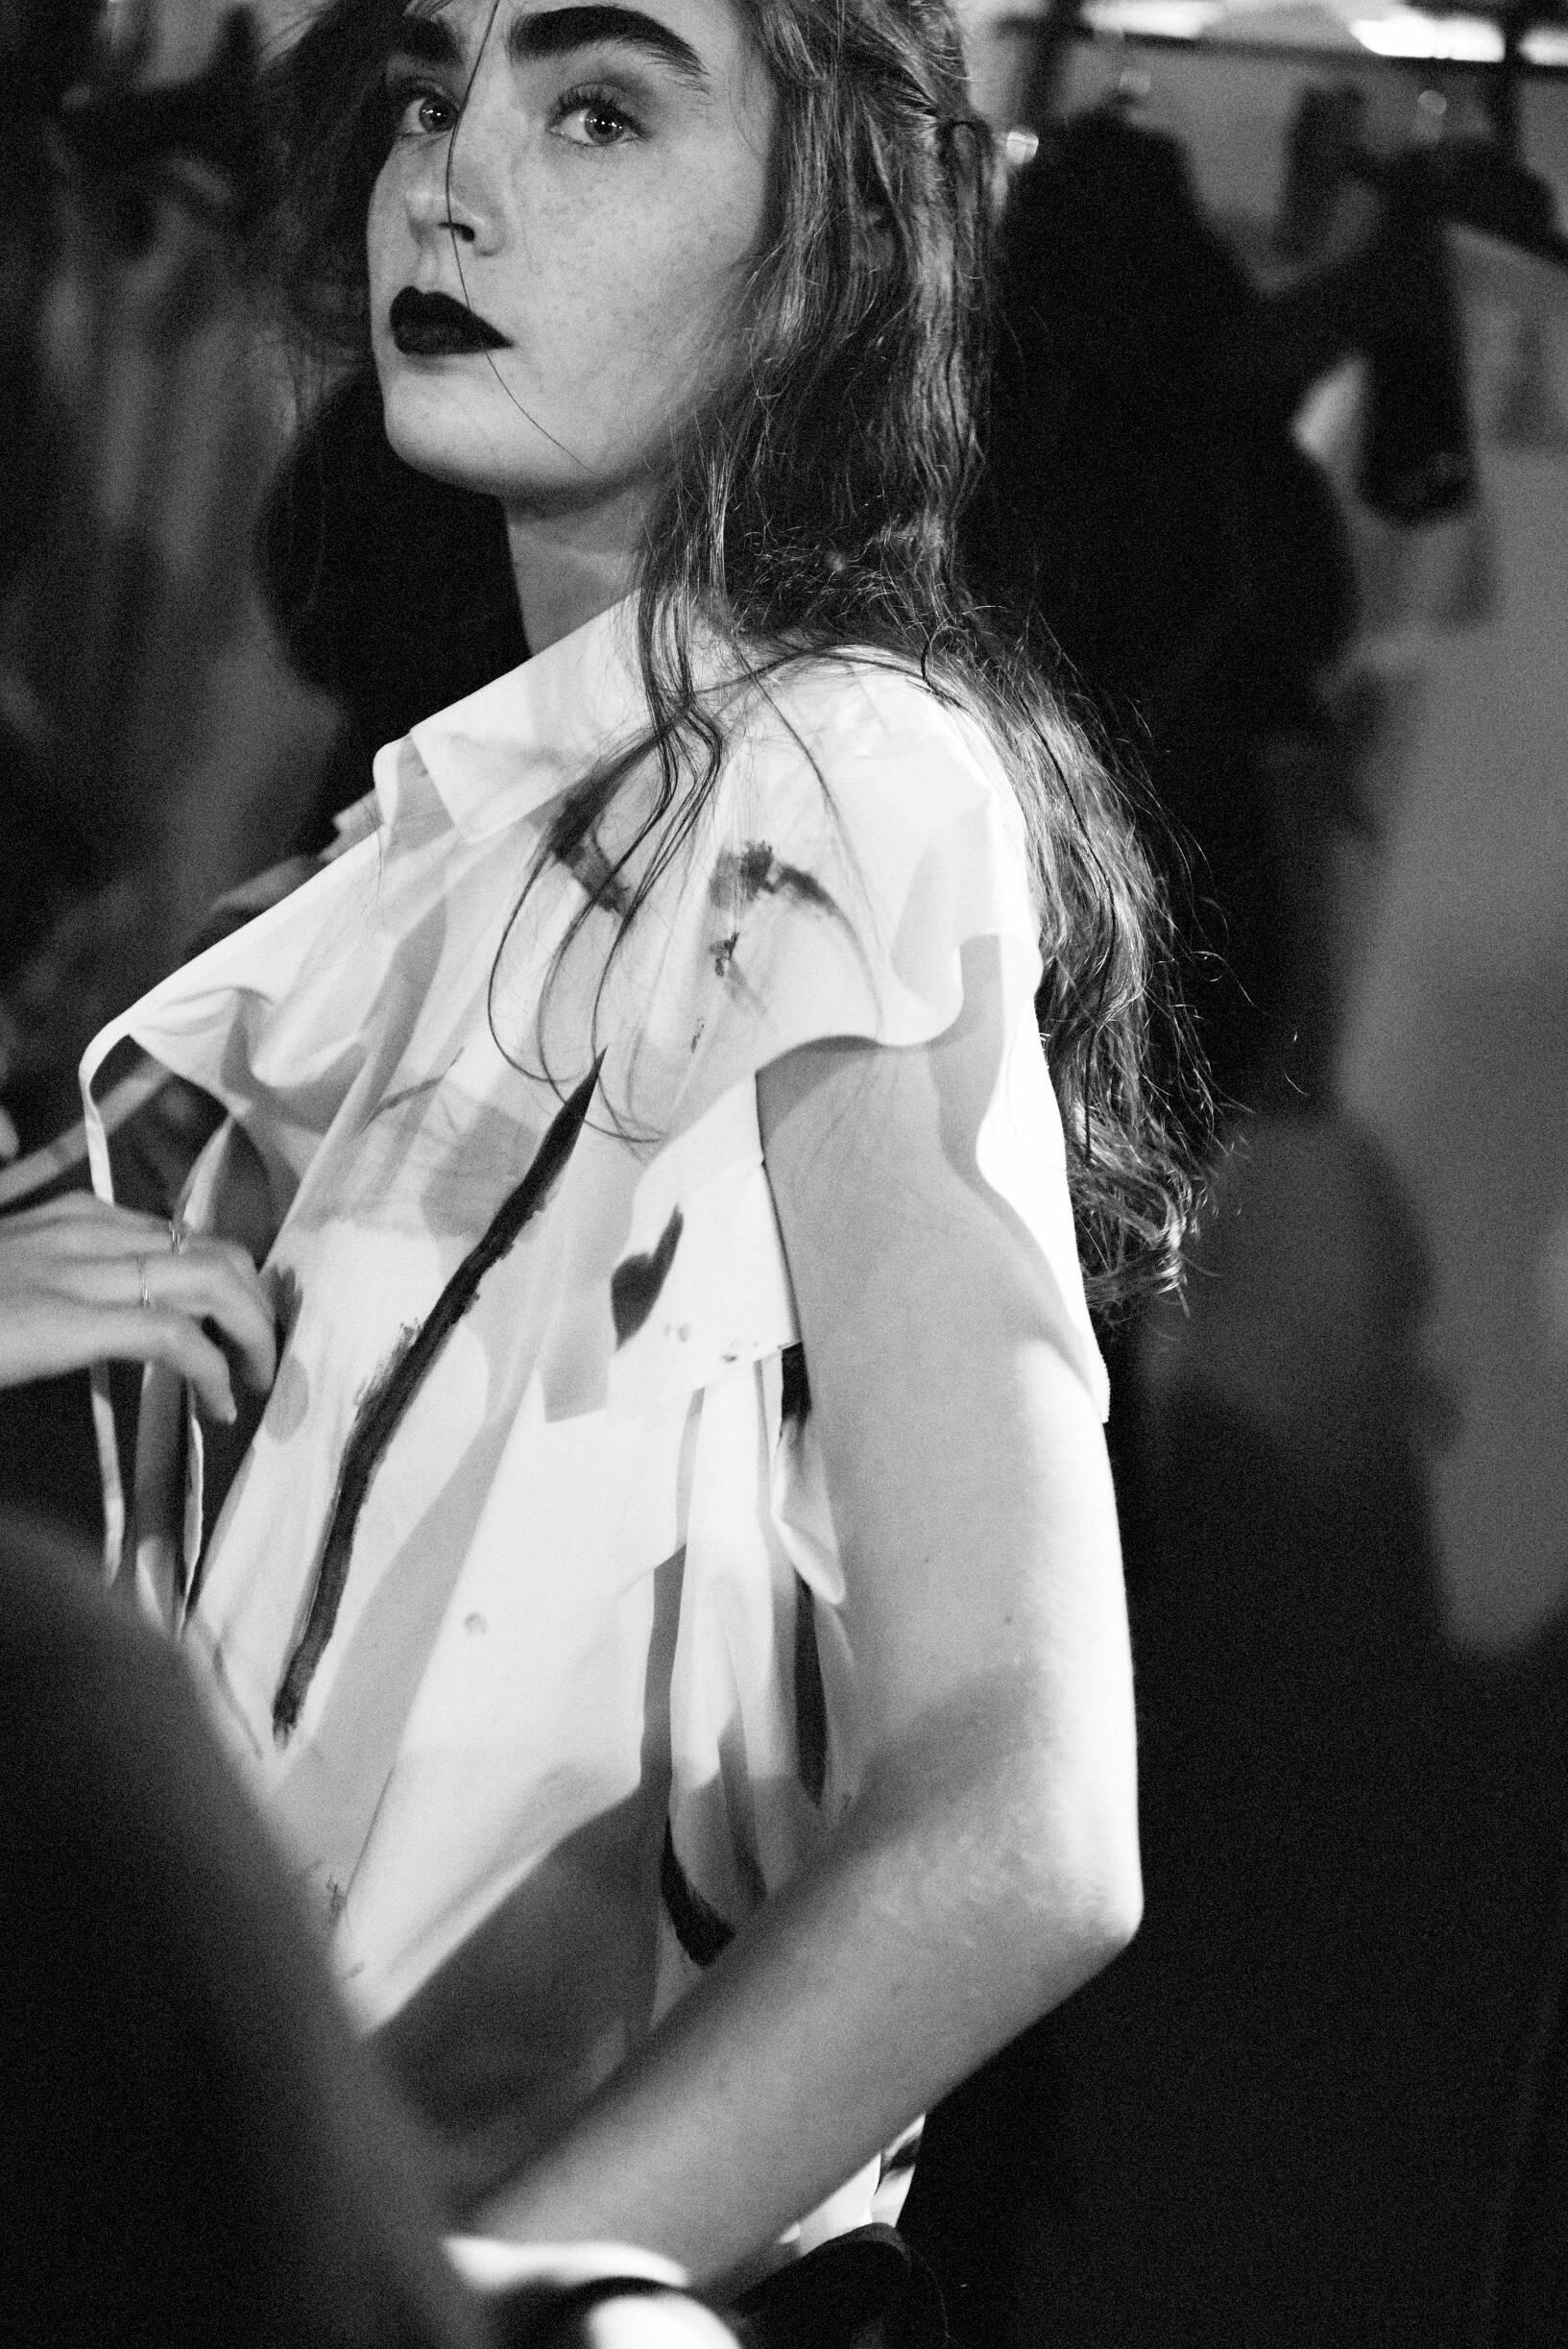 Backstage Yohji Yamamoto Model 2019-20